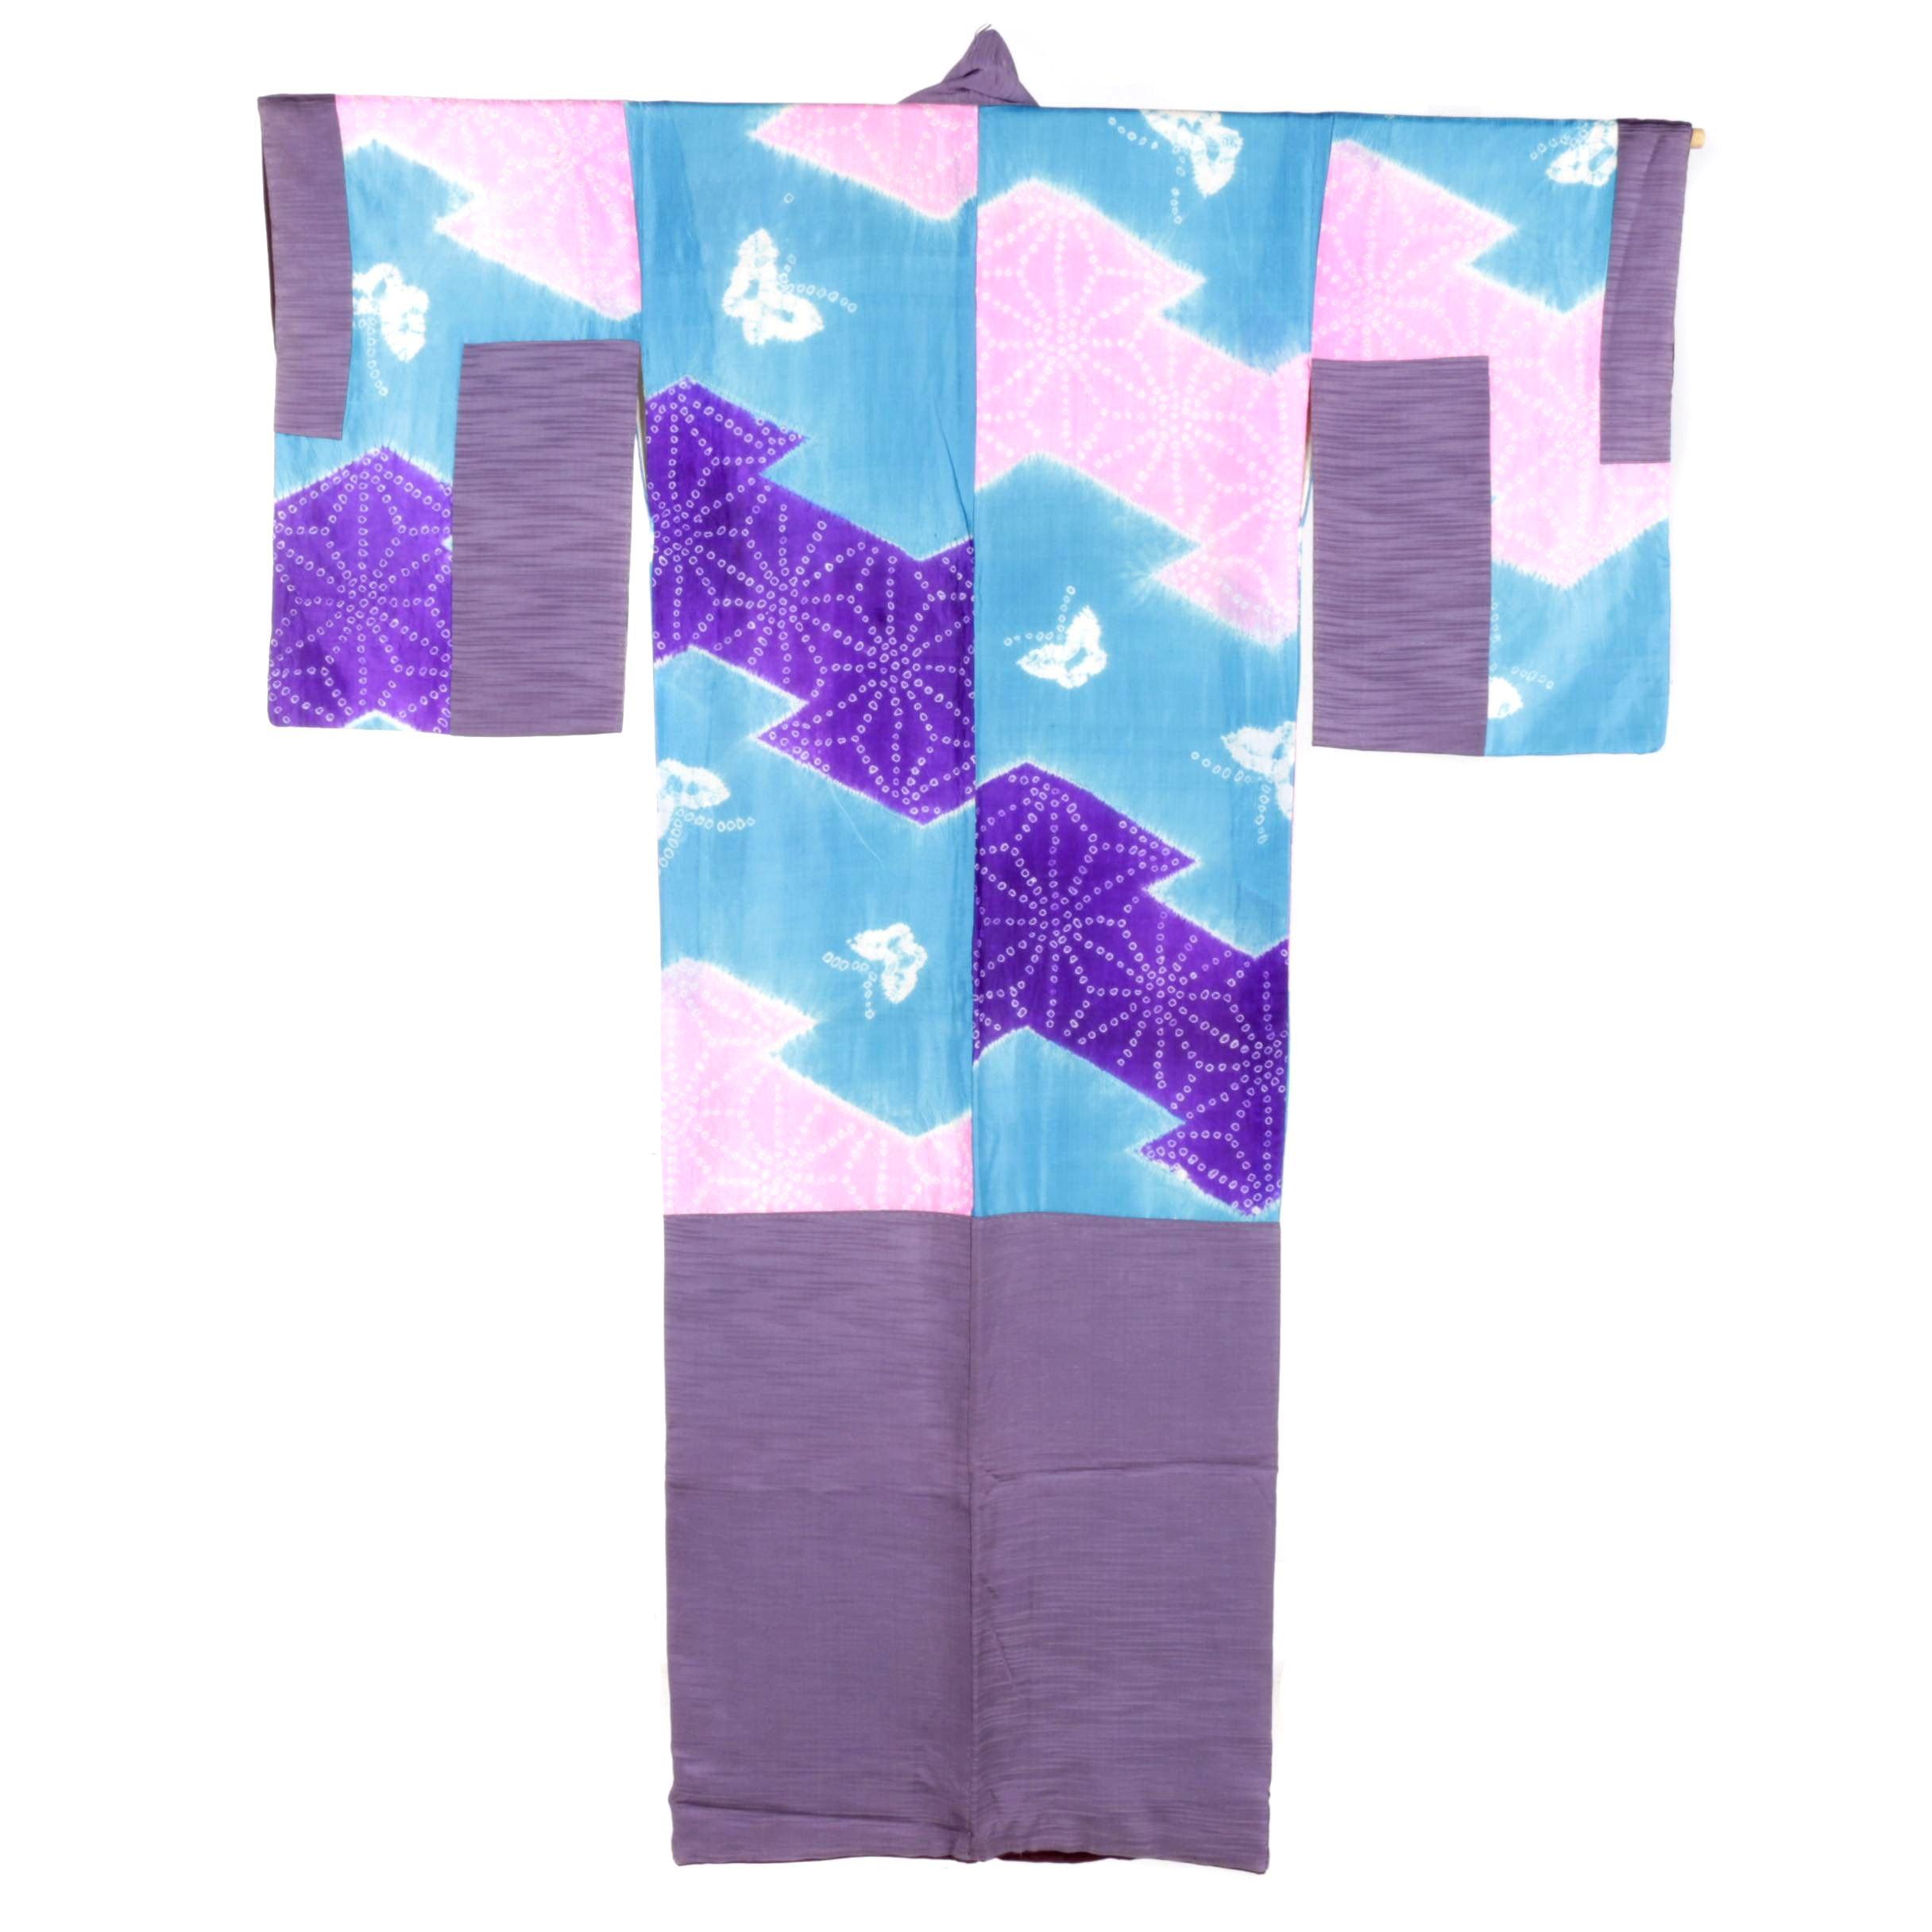 Circa 1900s Antique Patchwork Silk Crepe Kimono